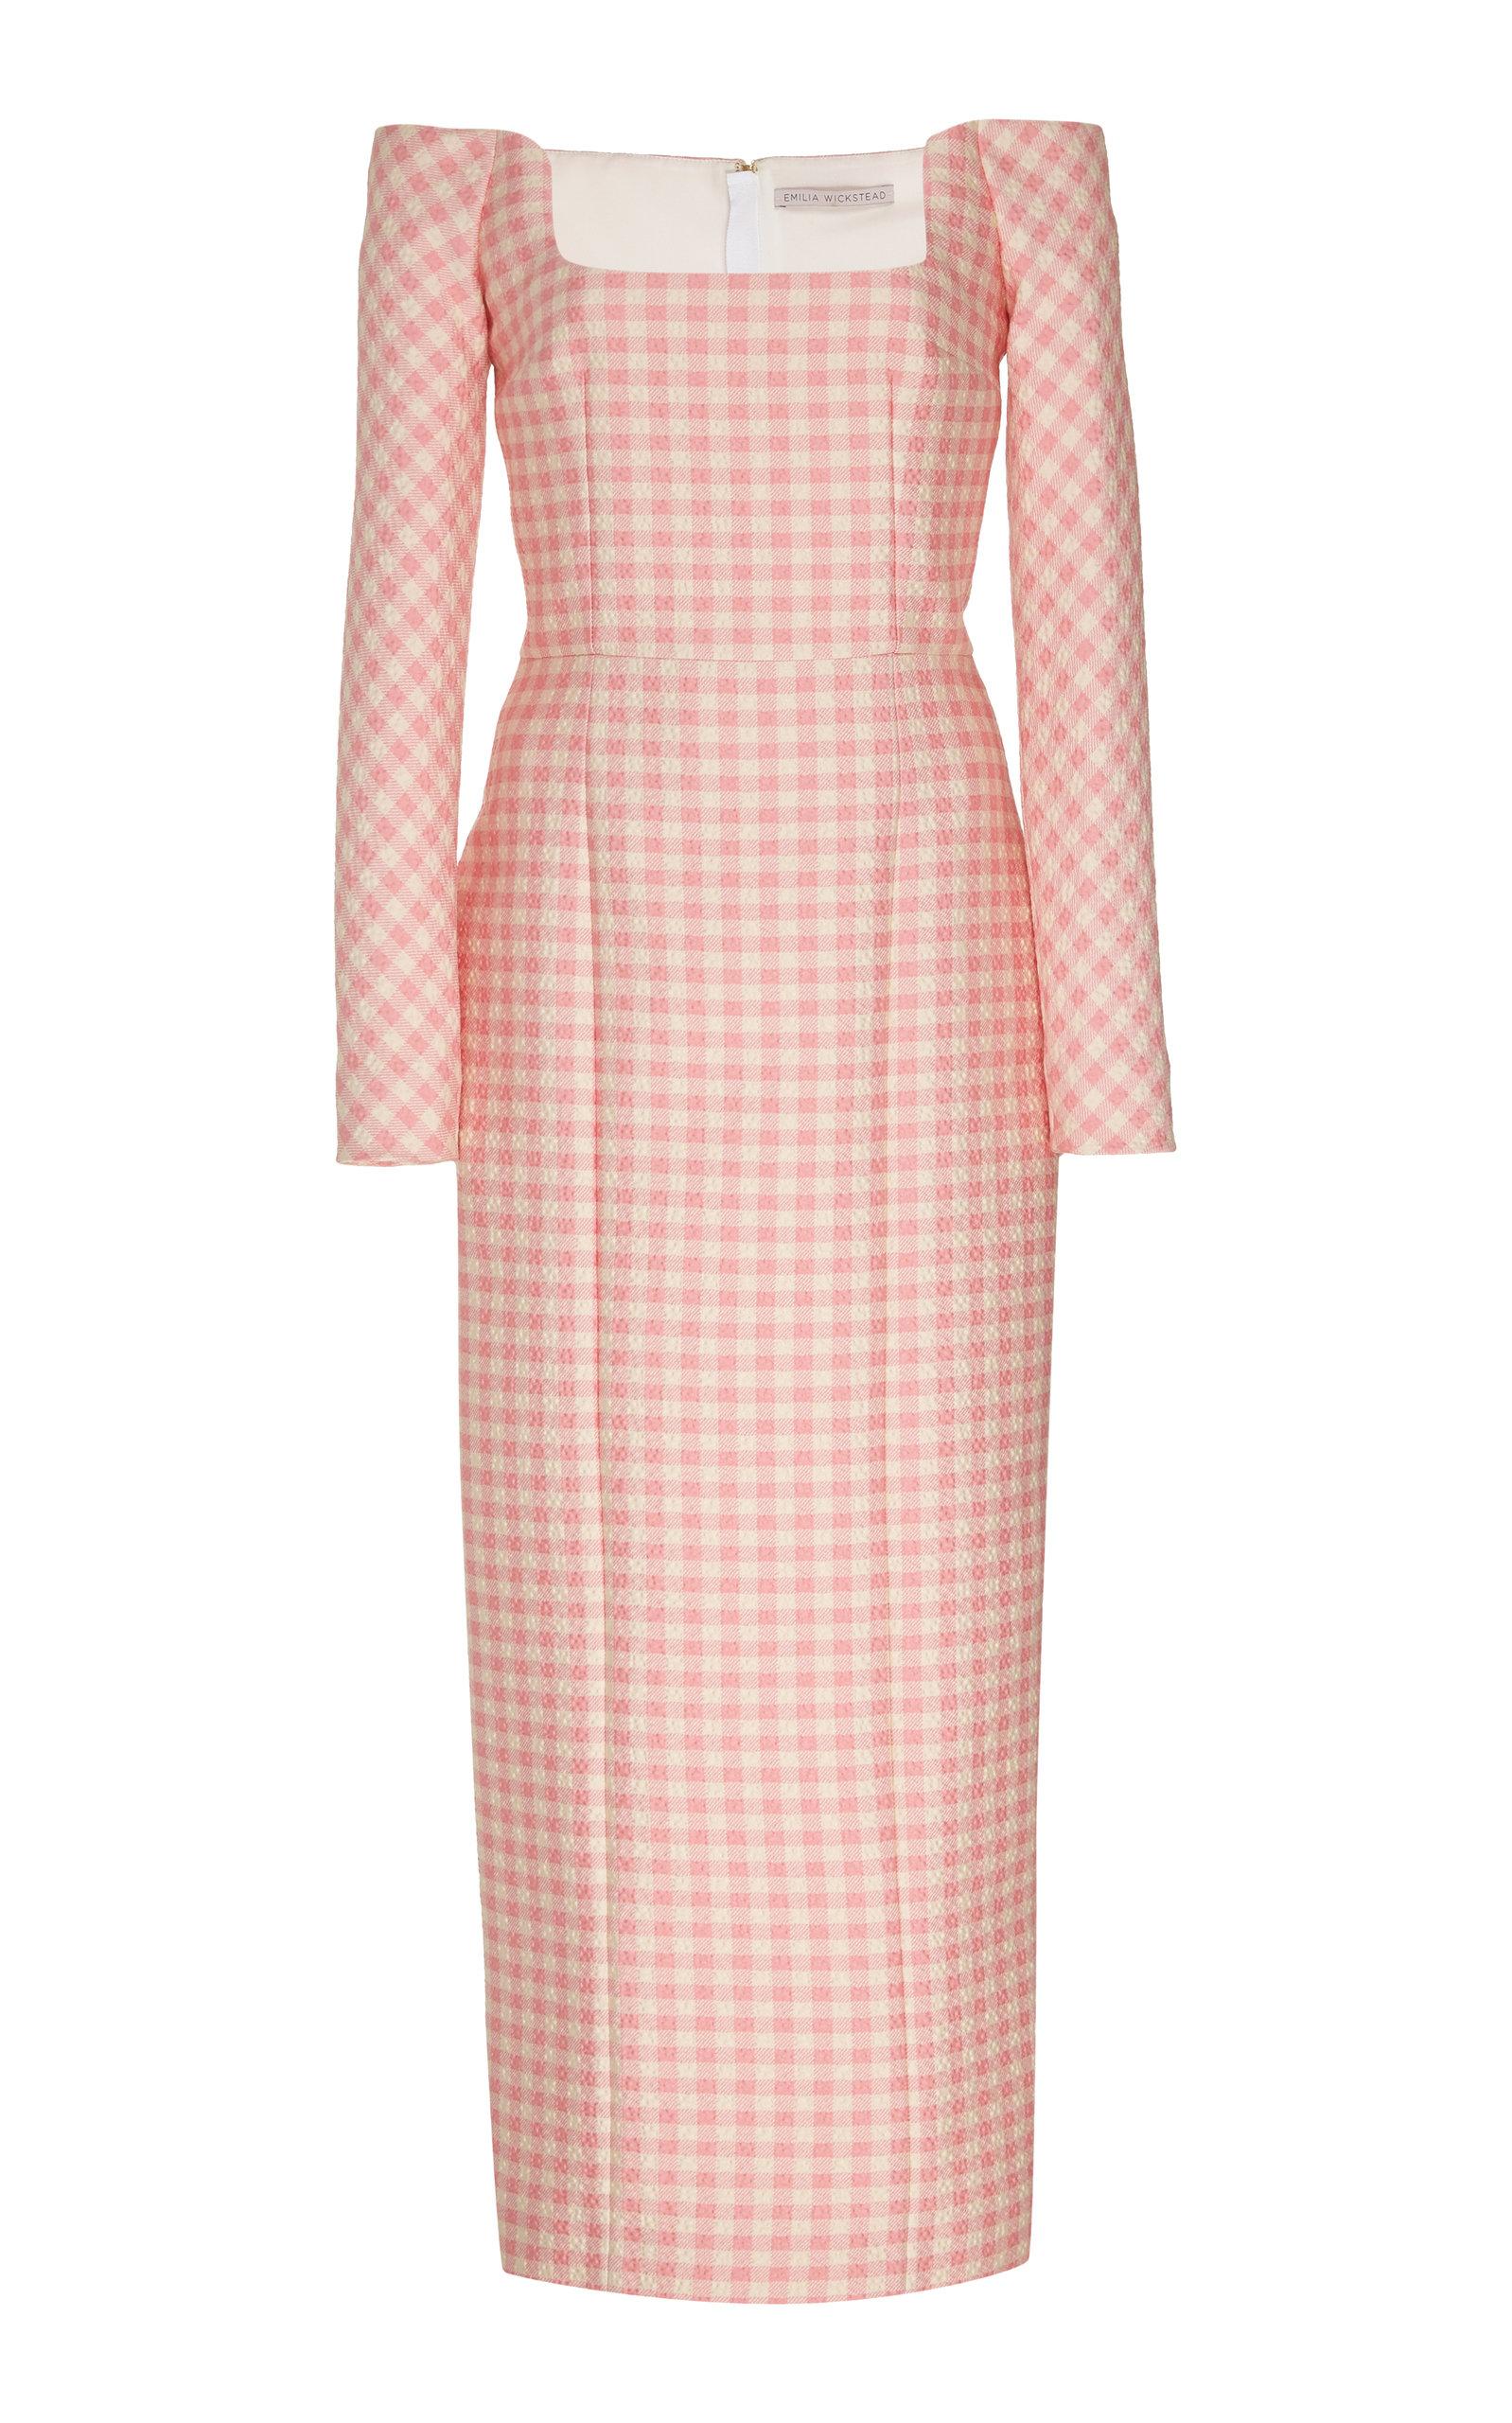 Buy Emilia Wickstead Off-The-Shoulder Gingham Dress online, shop Emilia Wickstead at the best price